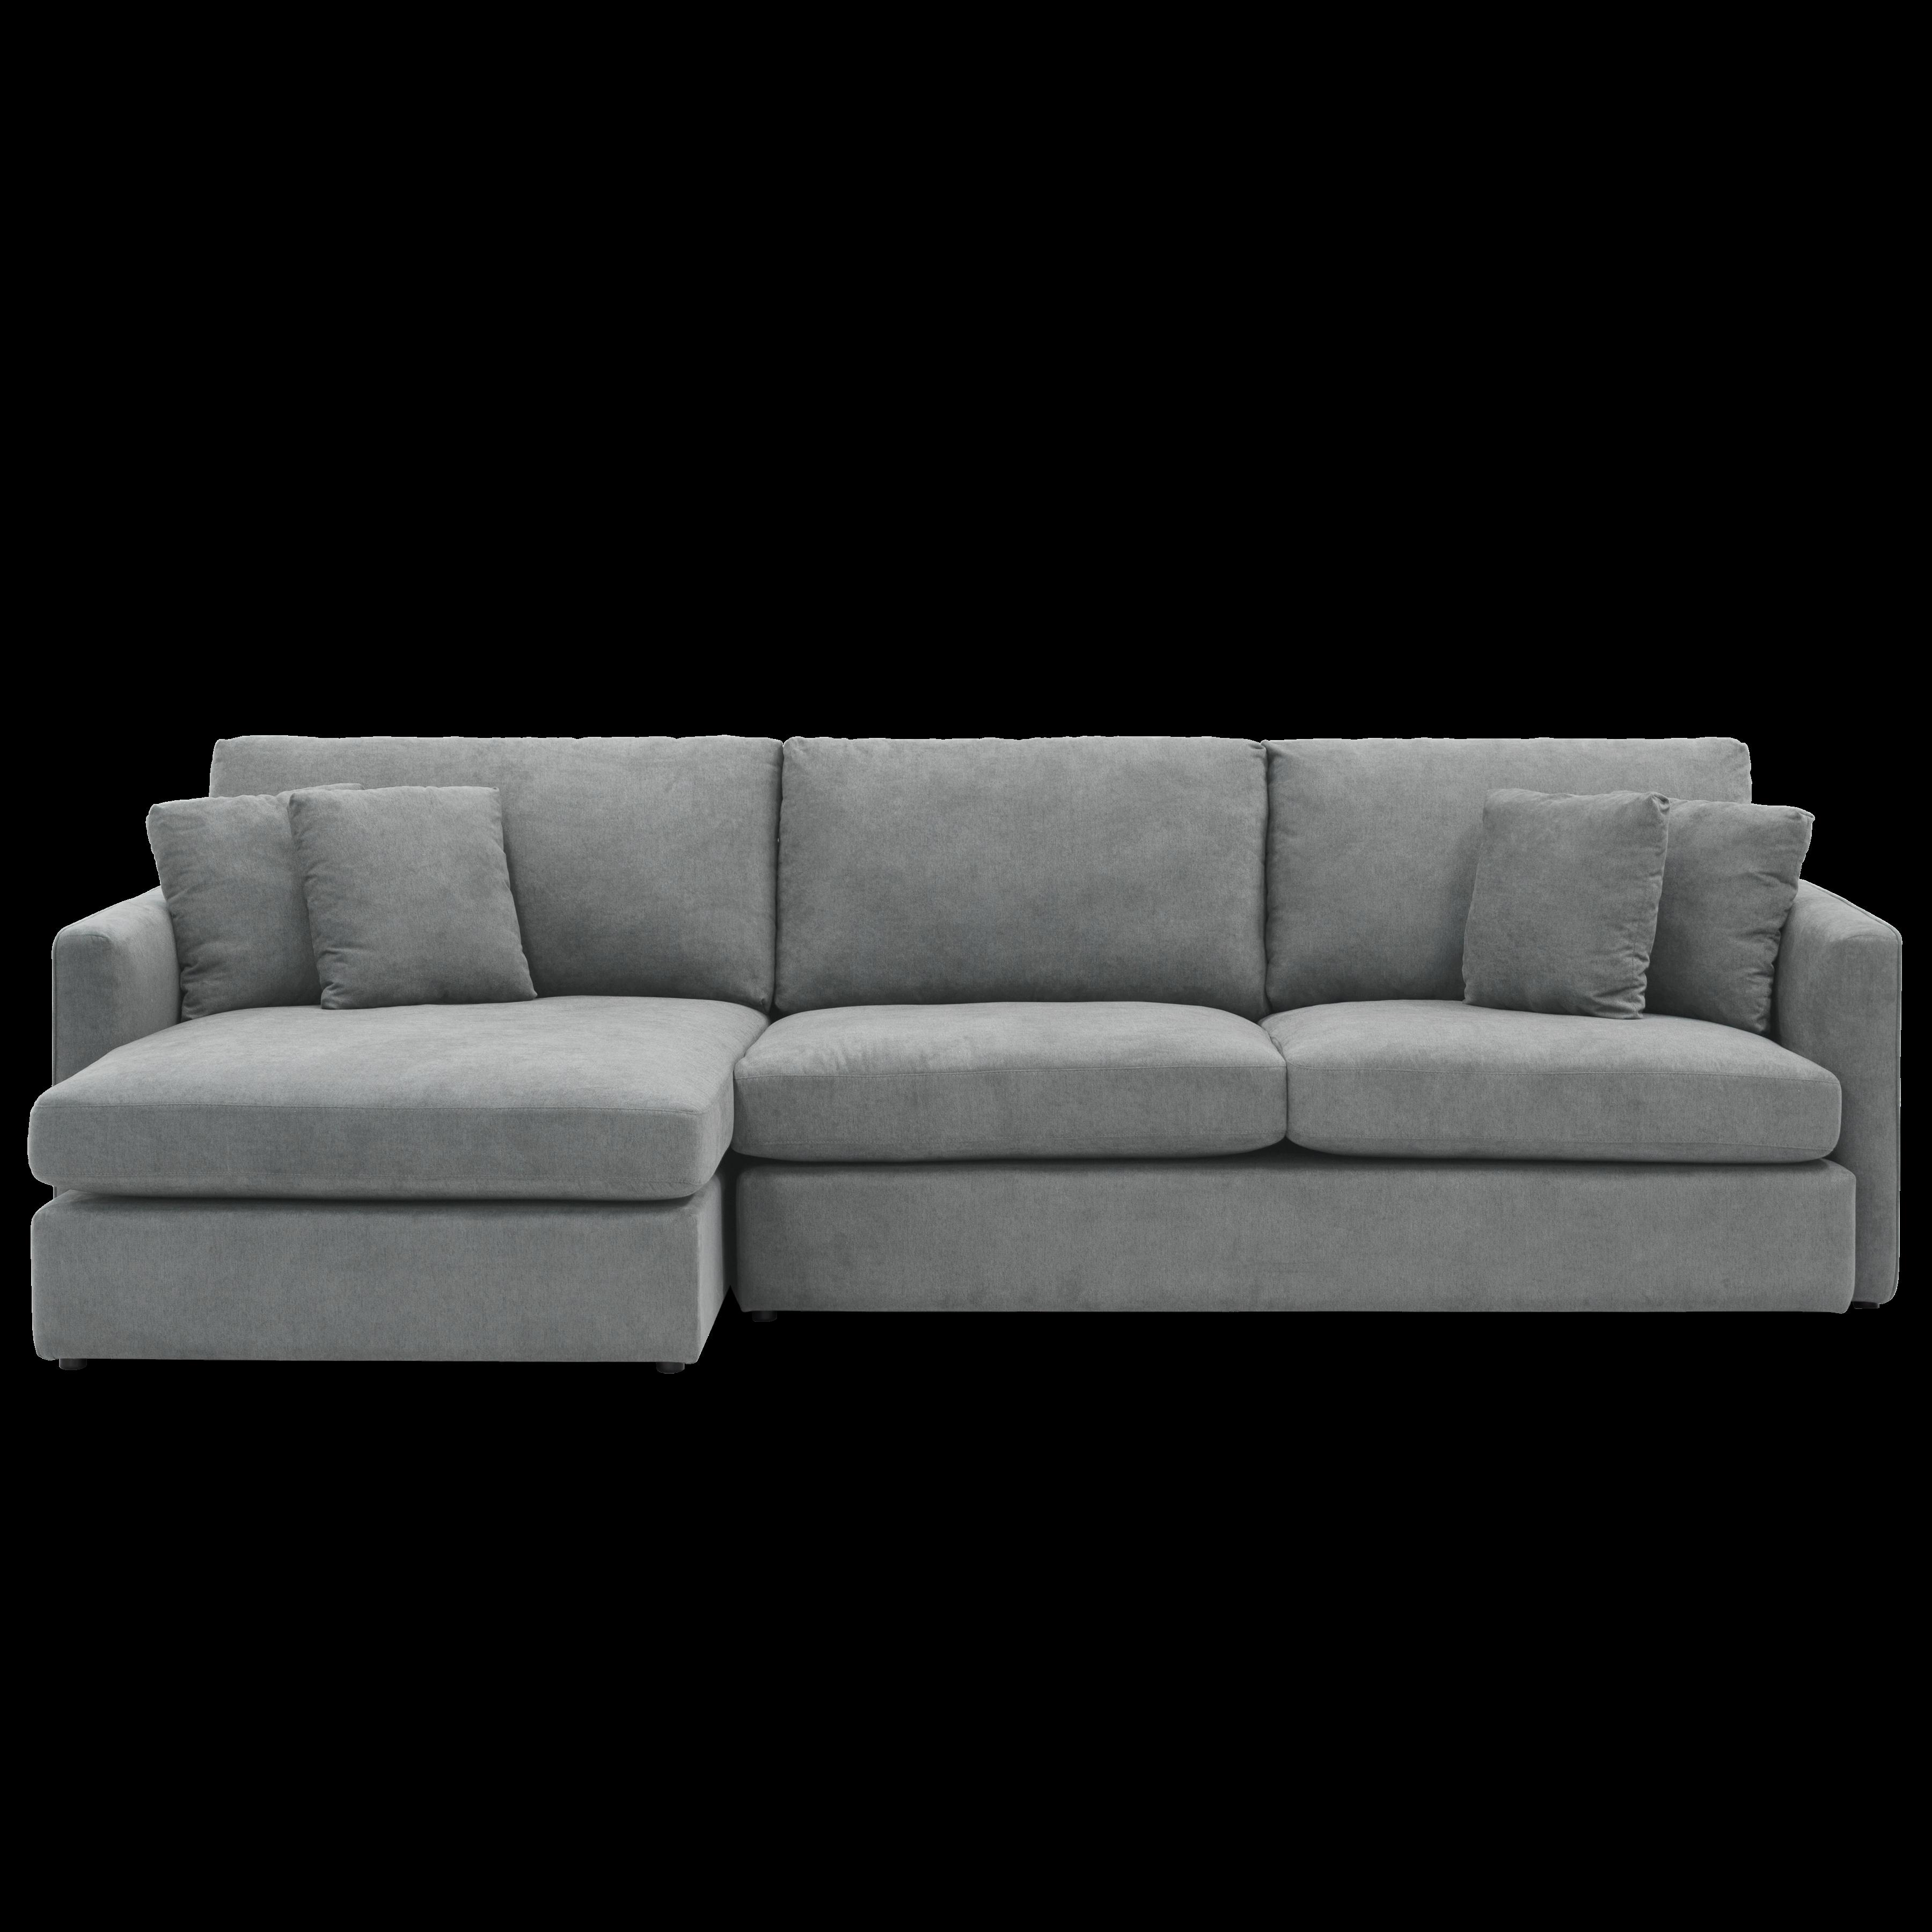 buy sofas online living room furniture hipvan singapore rh hipvan com